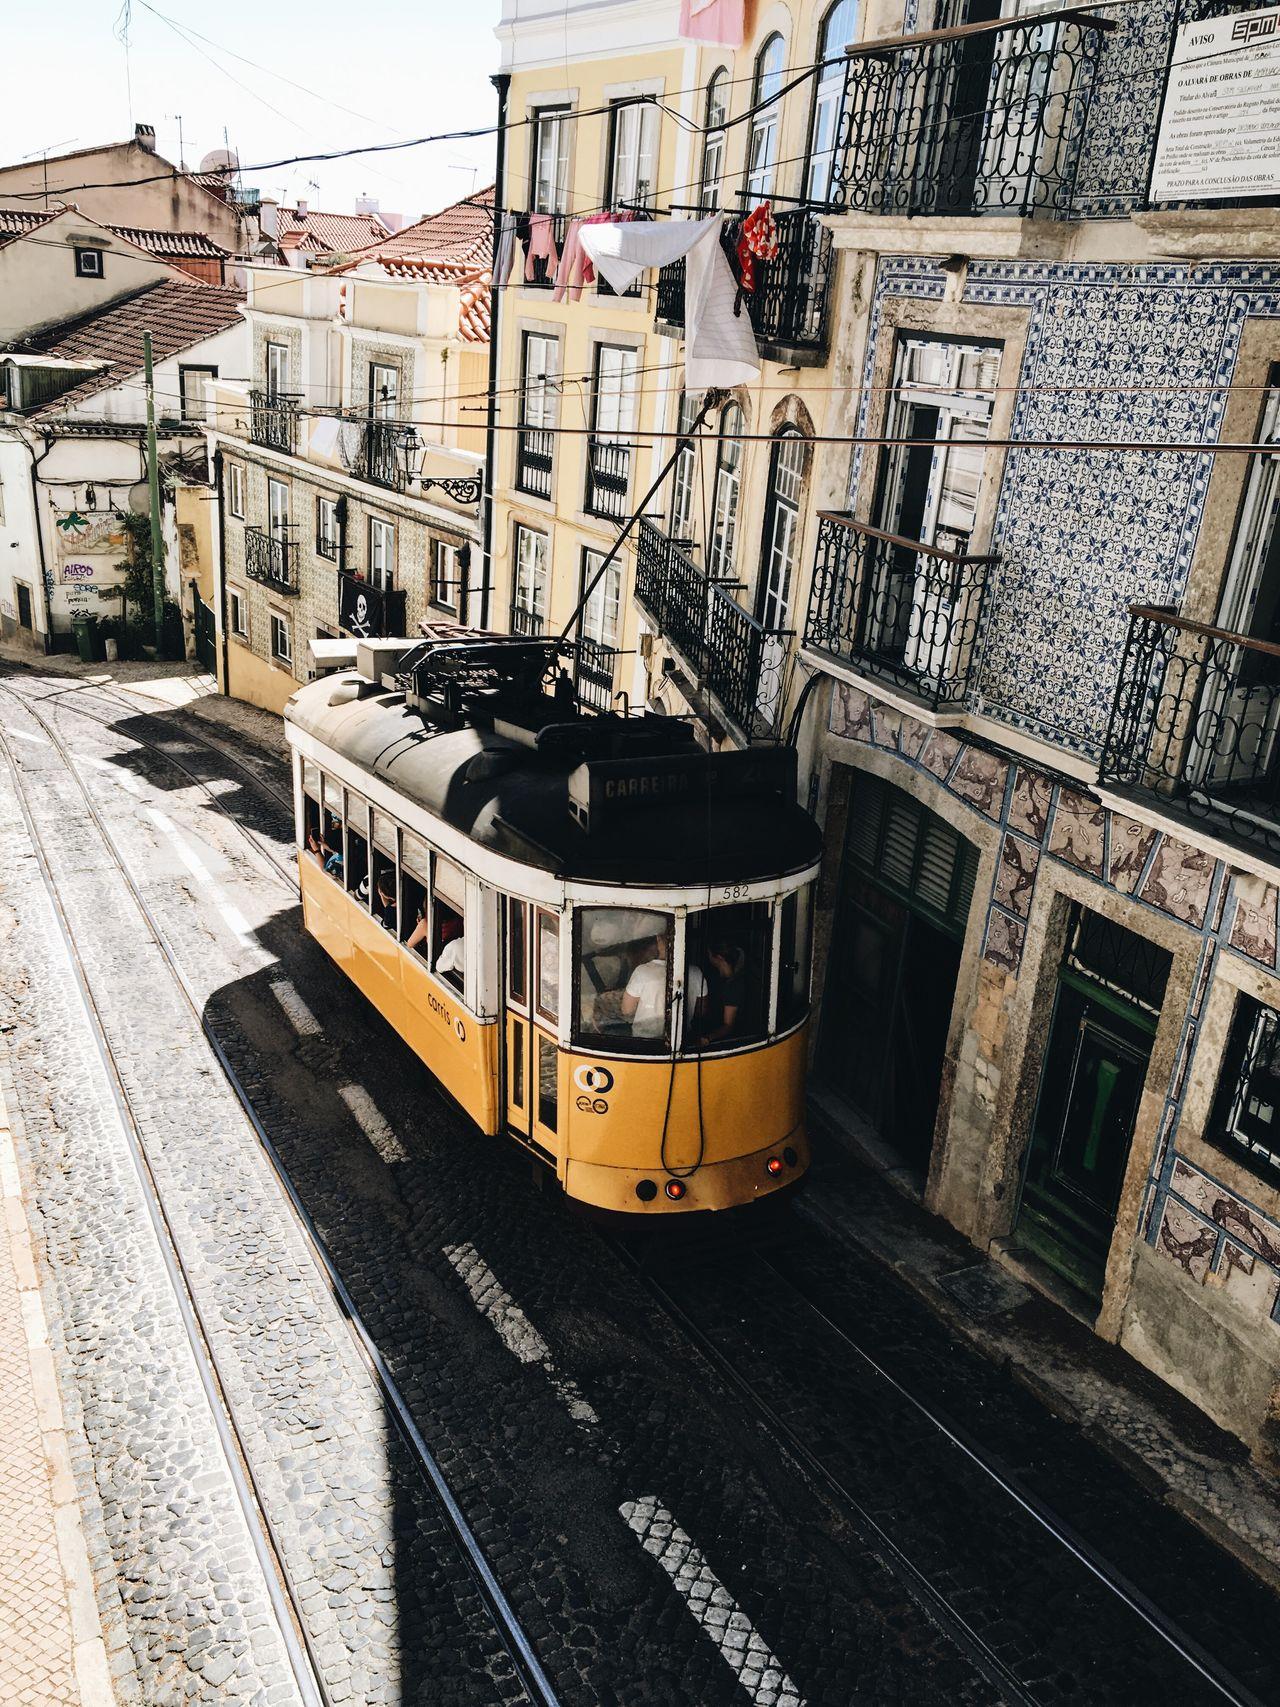 Lisboa Transportation Train - Vehicle Lisbon Lisboa Portugal Lisboa Lisbonlovers Tram Yellow Yellow Tram Europe City City Street City Life Portugal Neighborhood Map